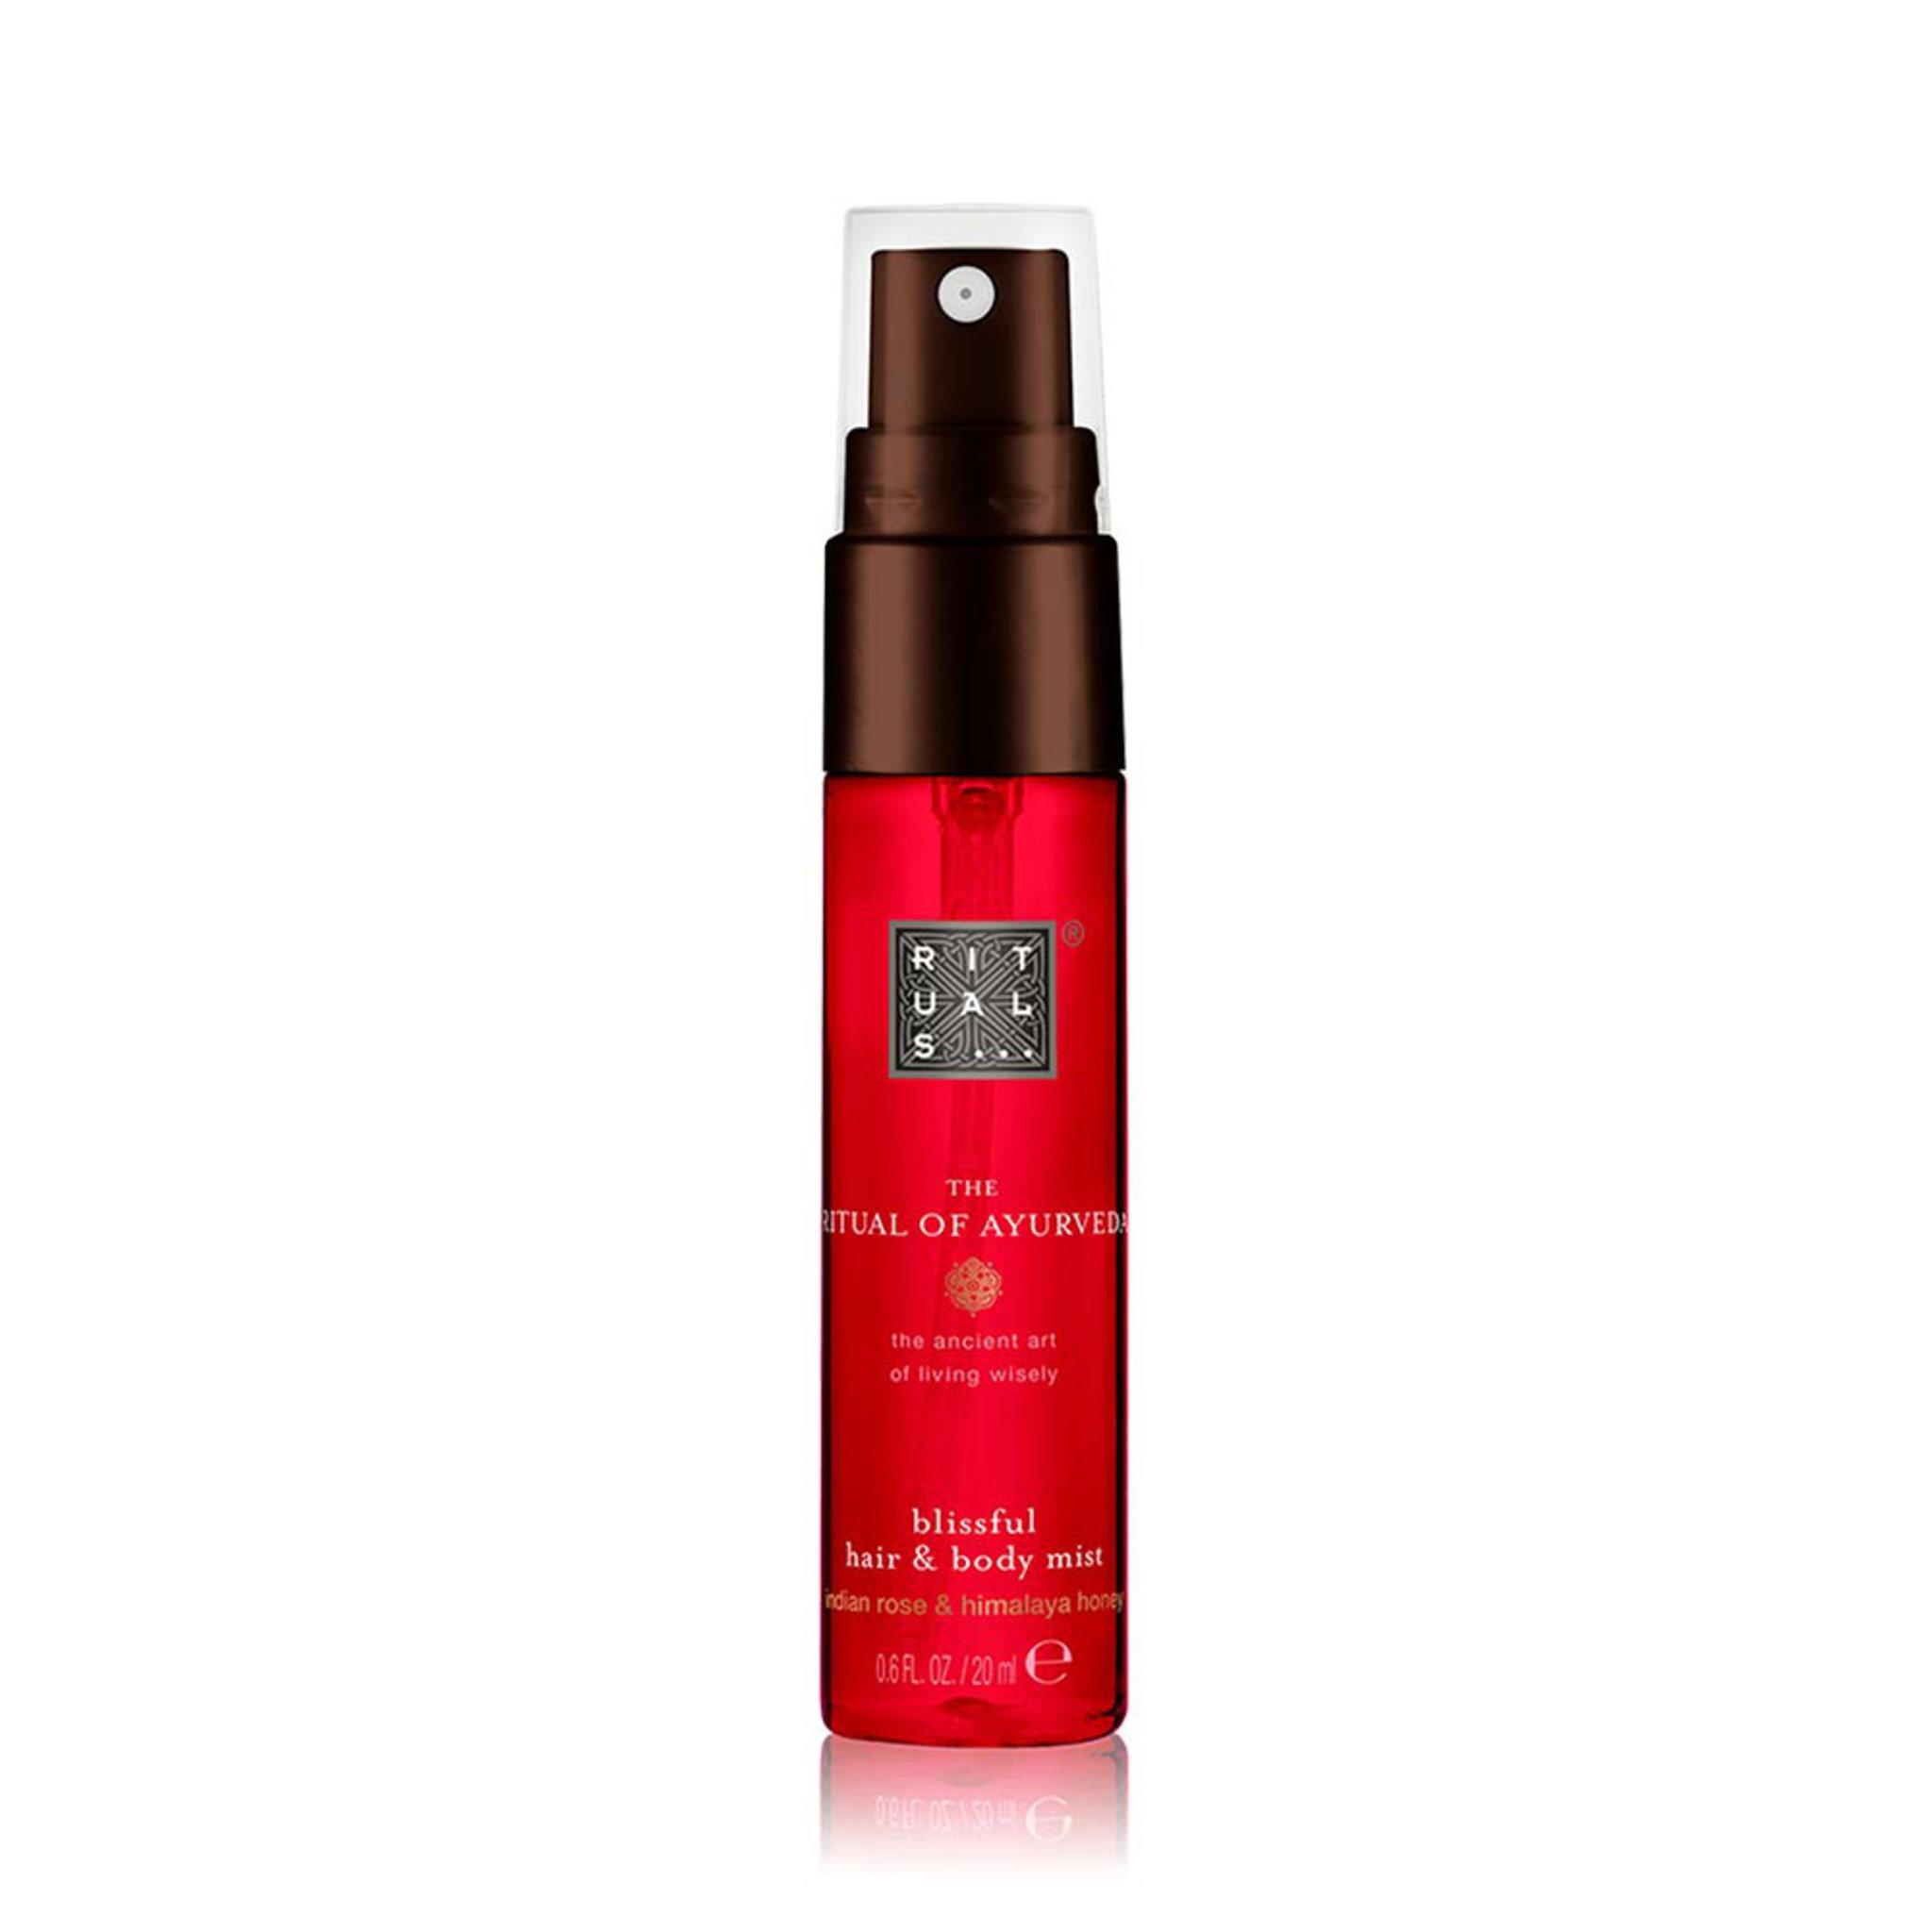 The Ritual of Ayurveda Hair & Body Mist, 20 ml